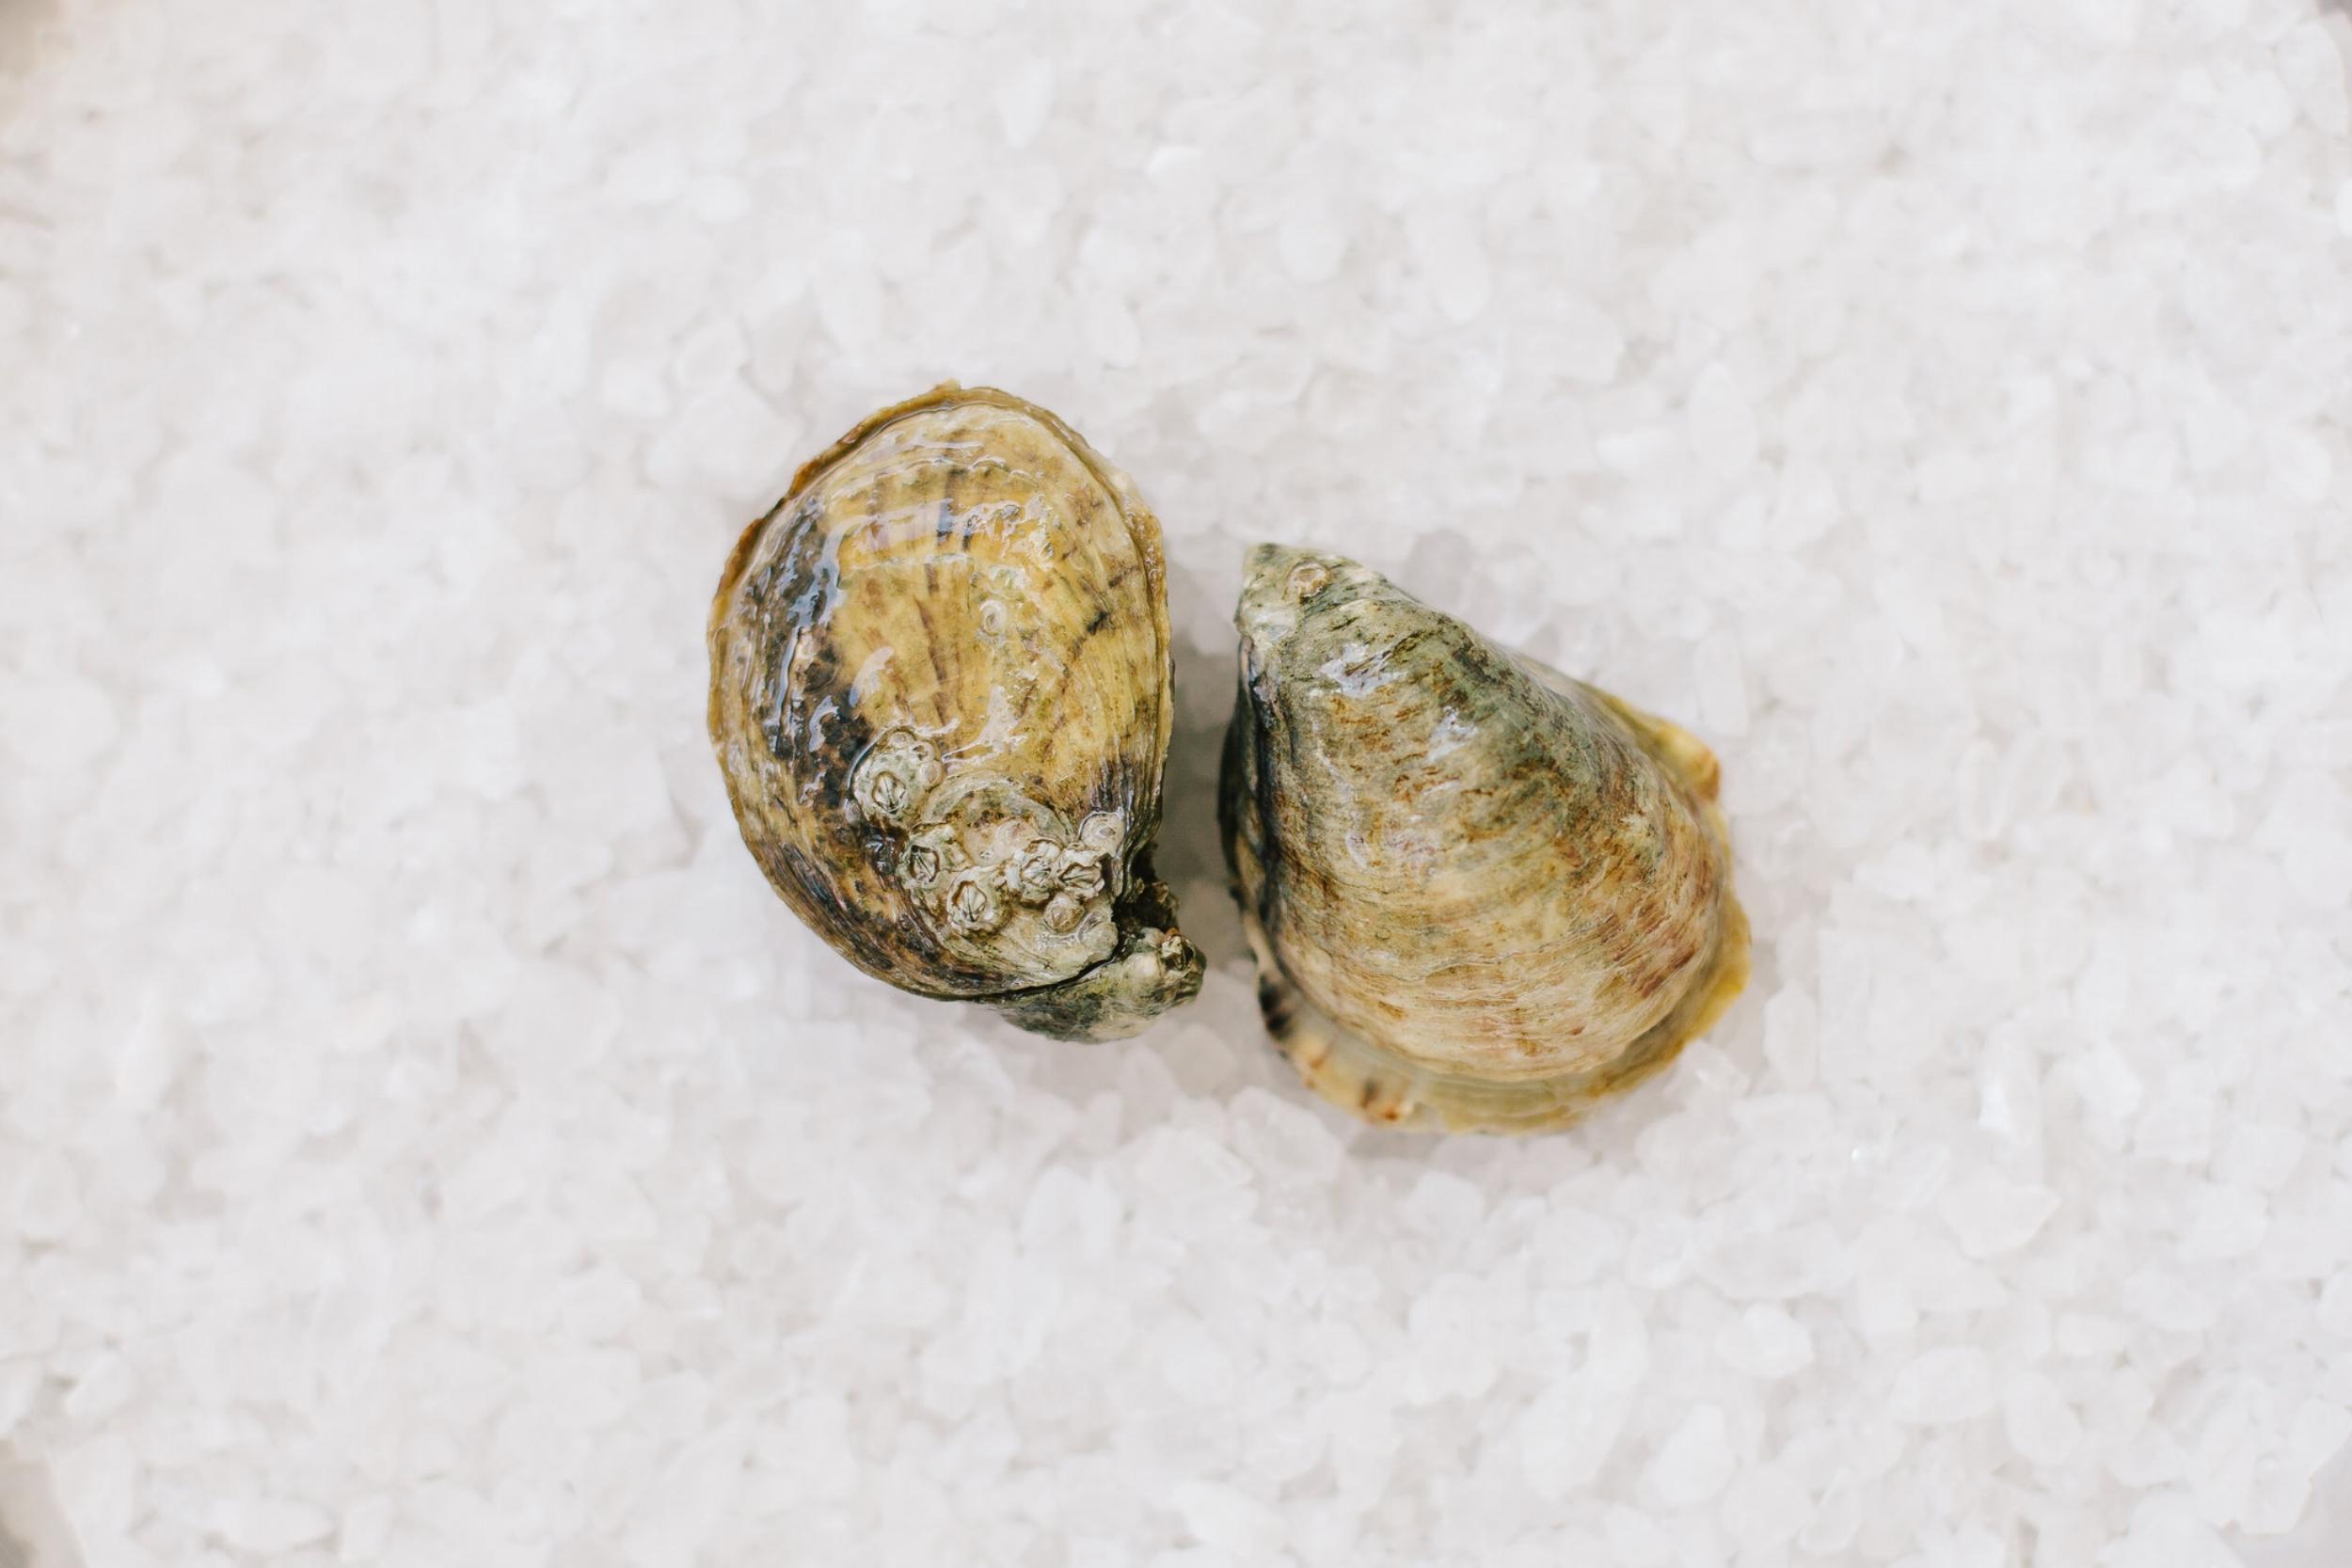 Shigoku - Origin:Willapa Bay, WashingtonFlavor Profile:Deep cup, firm flesh, medium brininess, and clean taste.